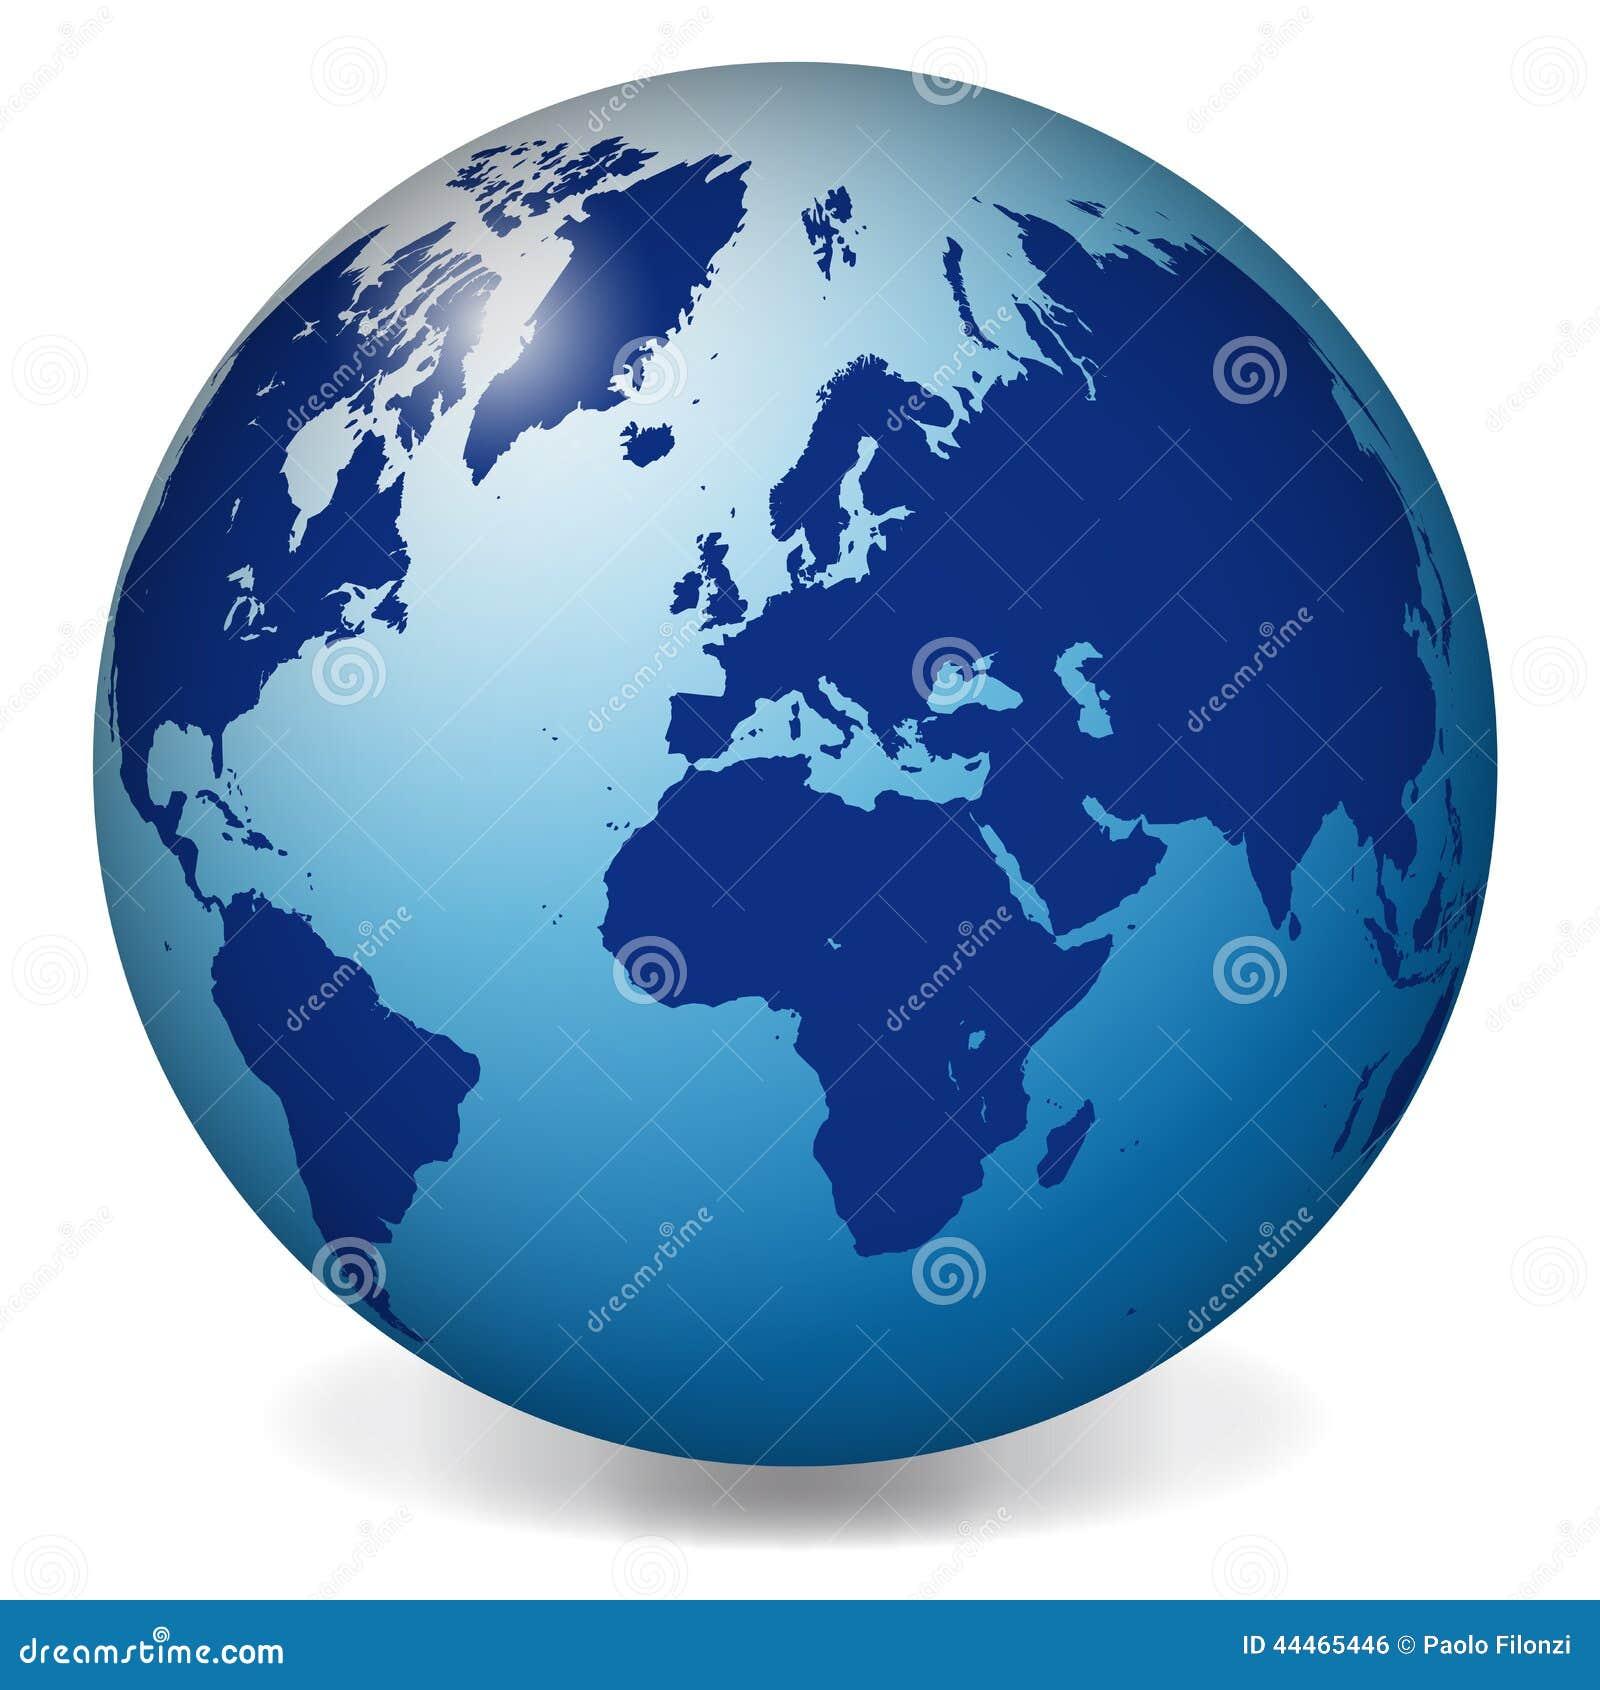 Blue world globe map stock vector illustration of activity 44465446 blue world globe map gumiabroncs Choice Image